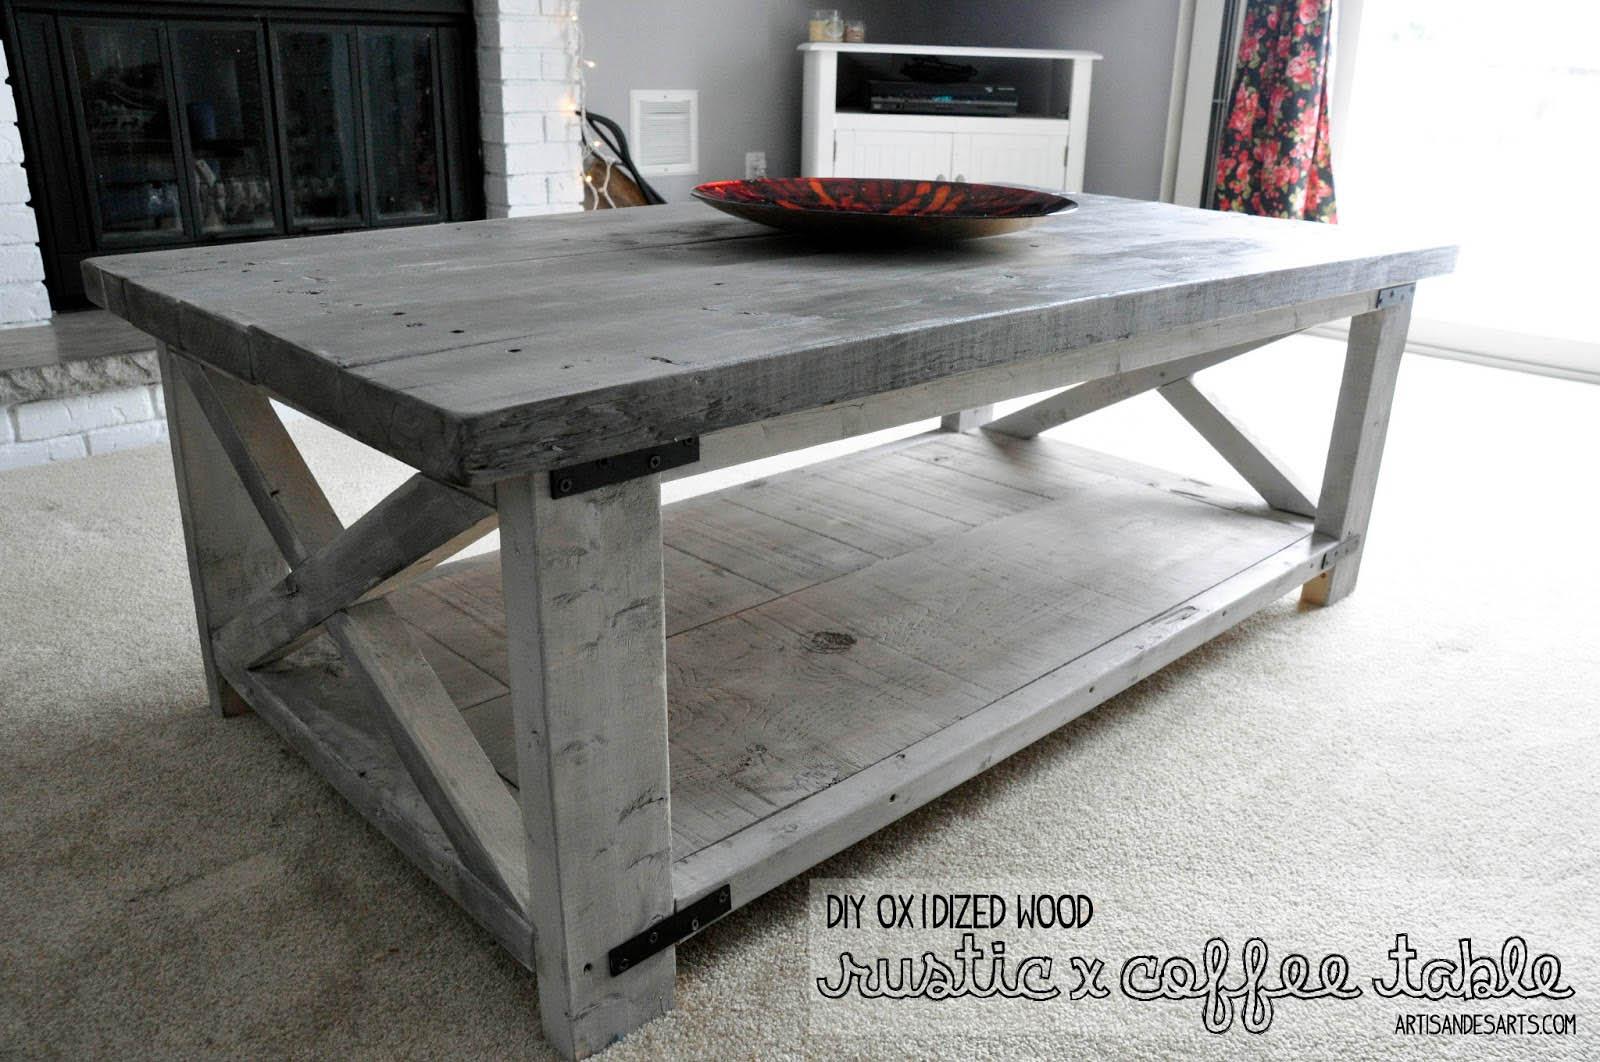 artisan des arts: DIY - Oxidized wood X coffee table